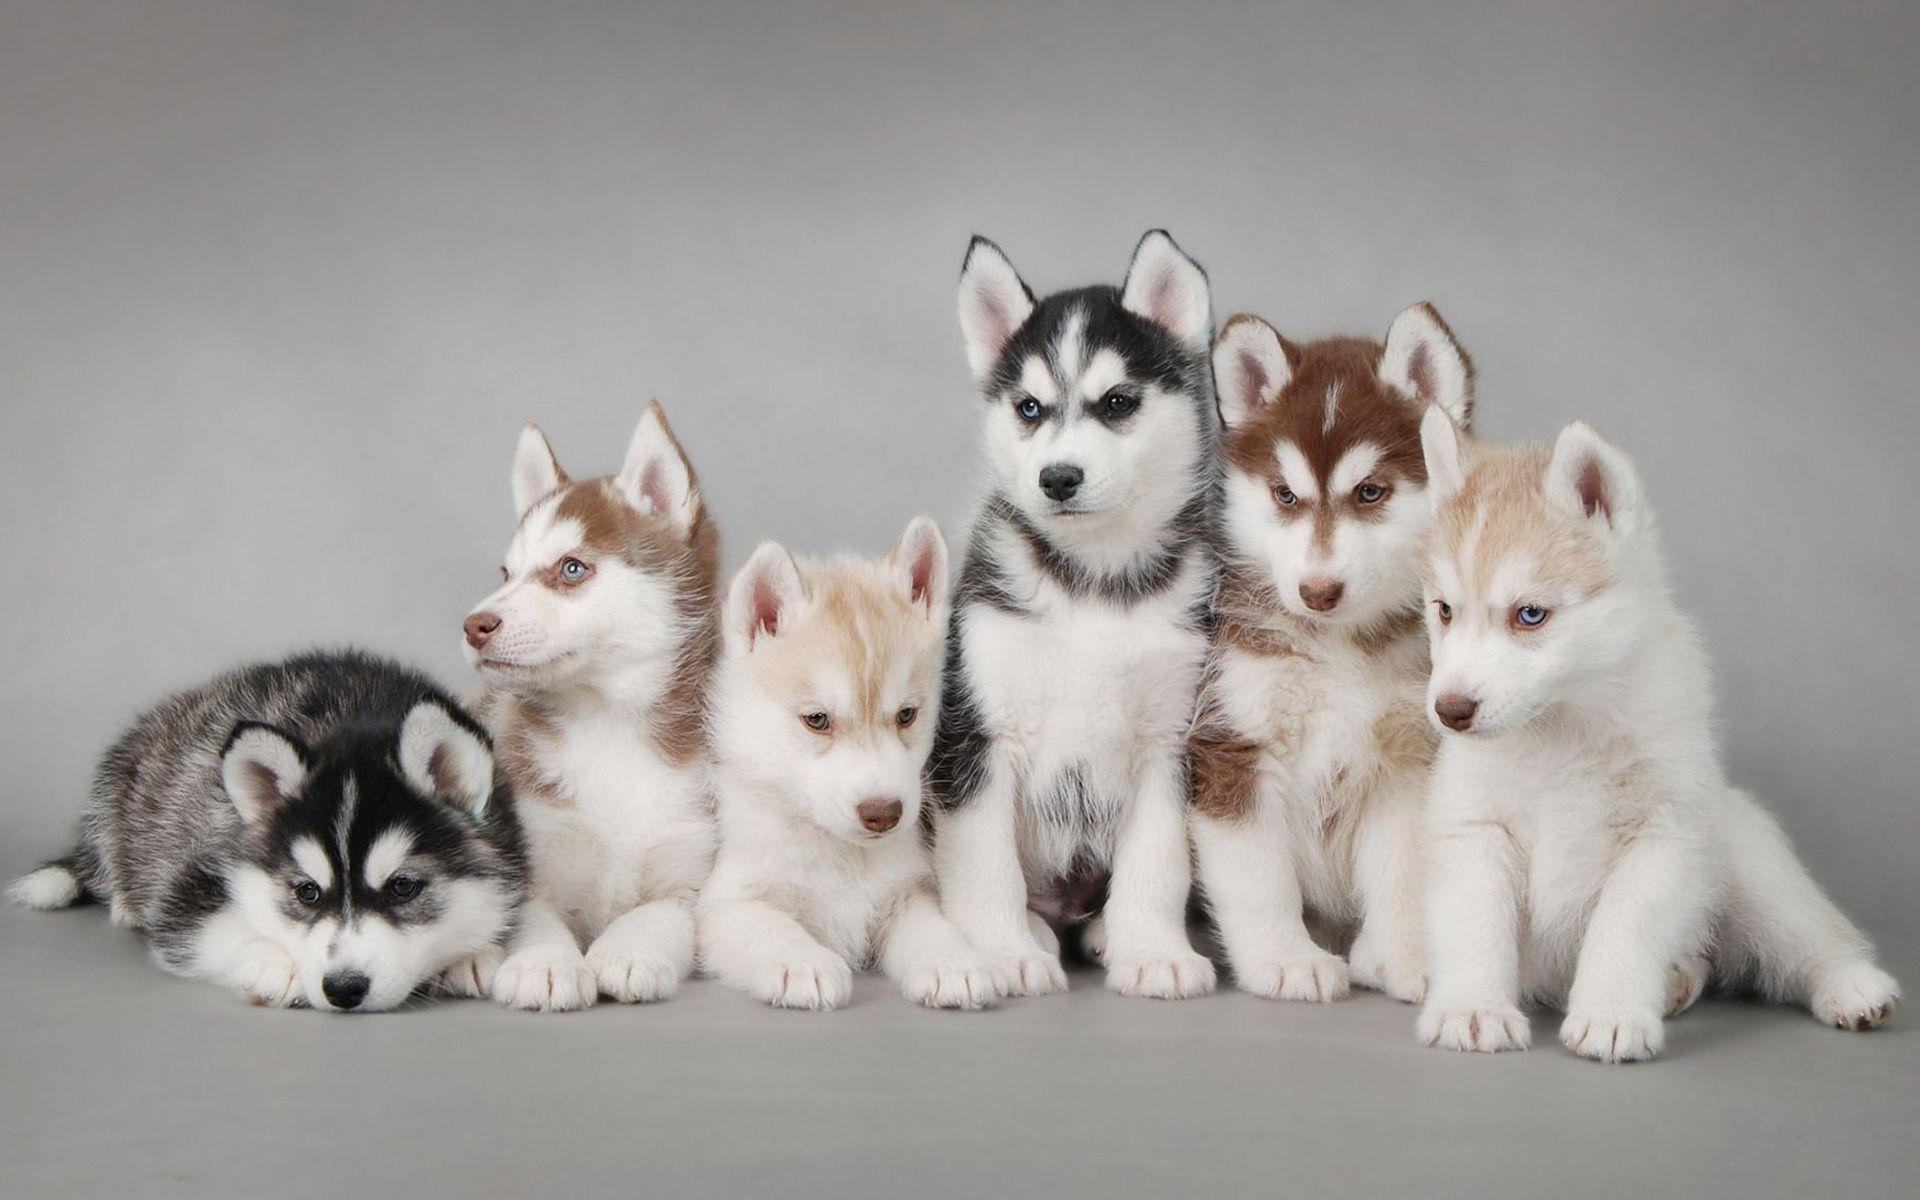 Http Pictrends In Wp Content Uploads 2013 12 Siberian Husky Puppies Dog Breeds Jpg Husky Puppy Cute Husky Cute Animals